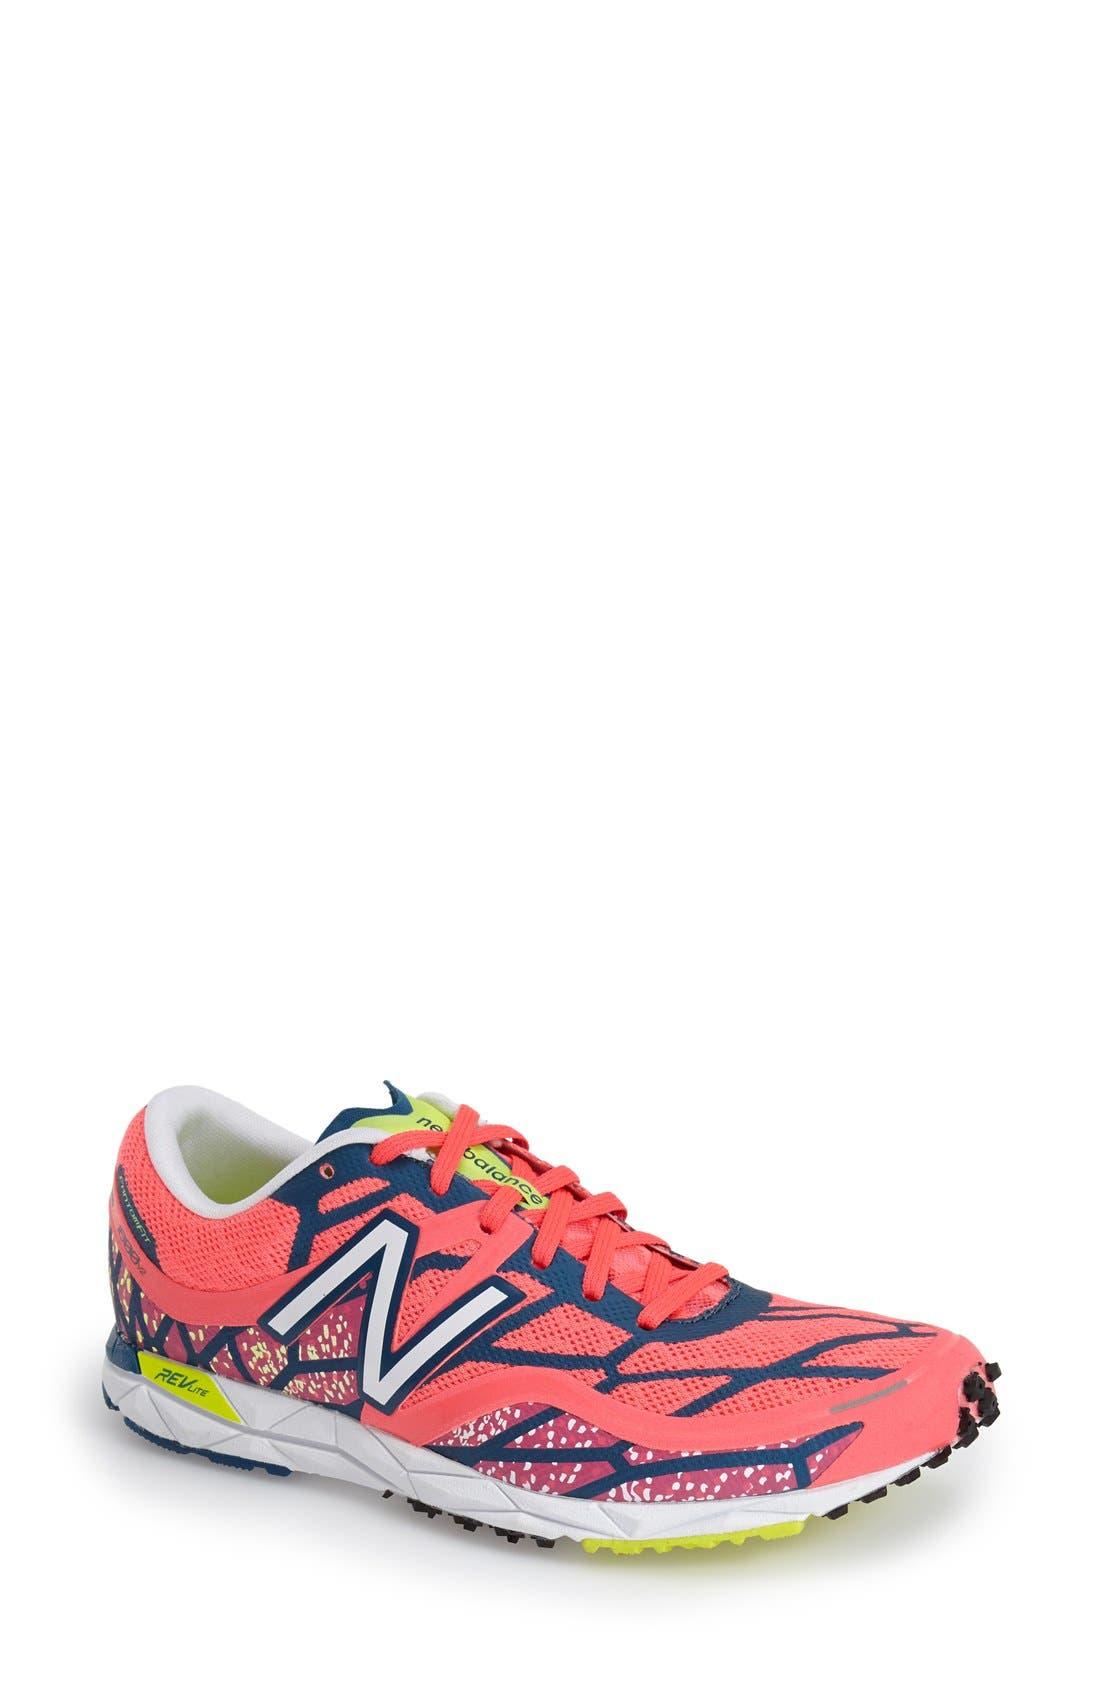 Alternate Image 1 Selected - New Balance '1600' Running Shoe (Women)